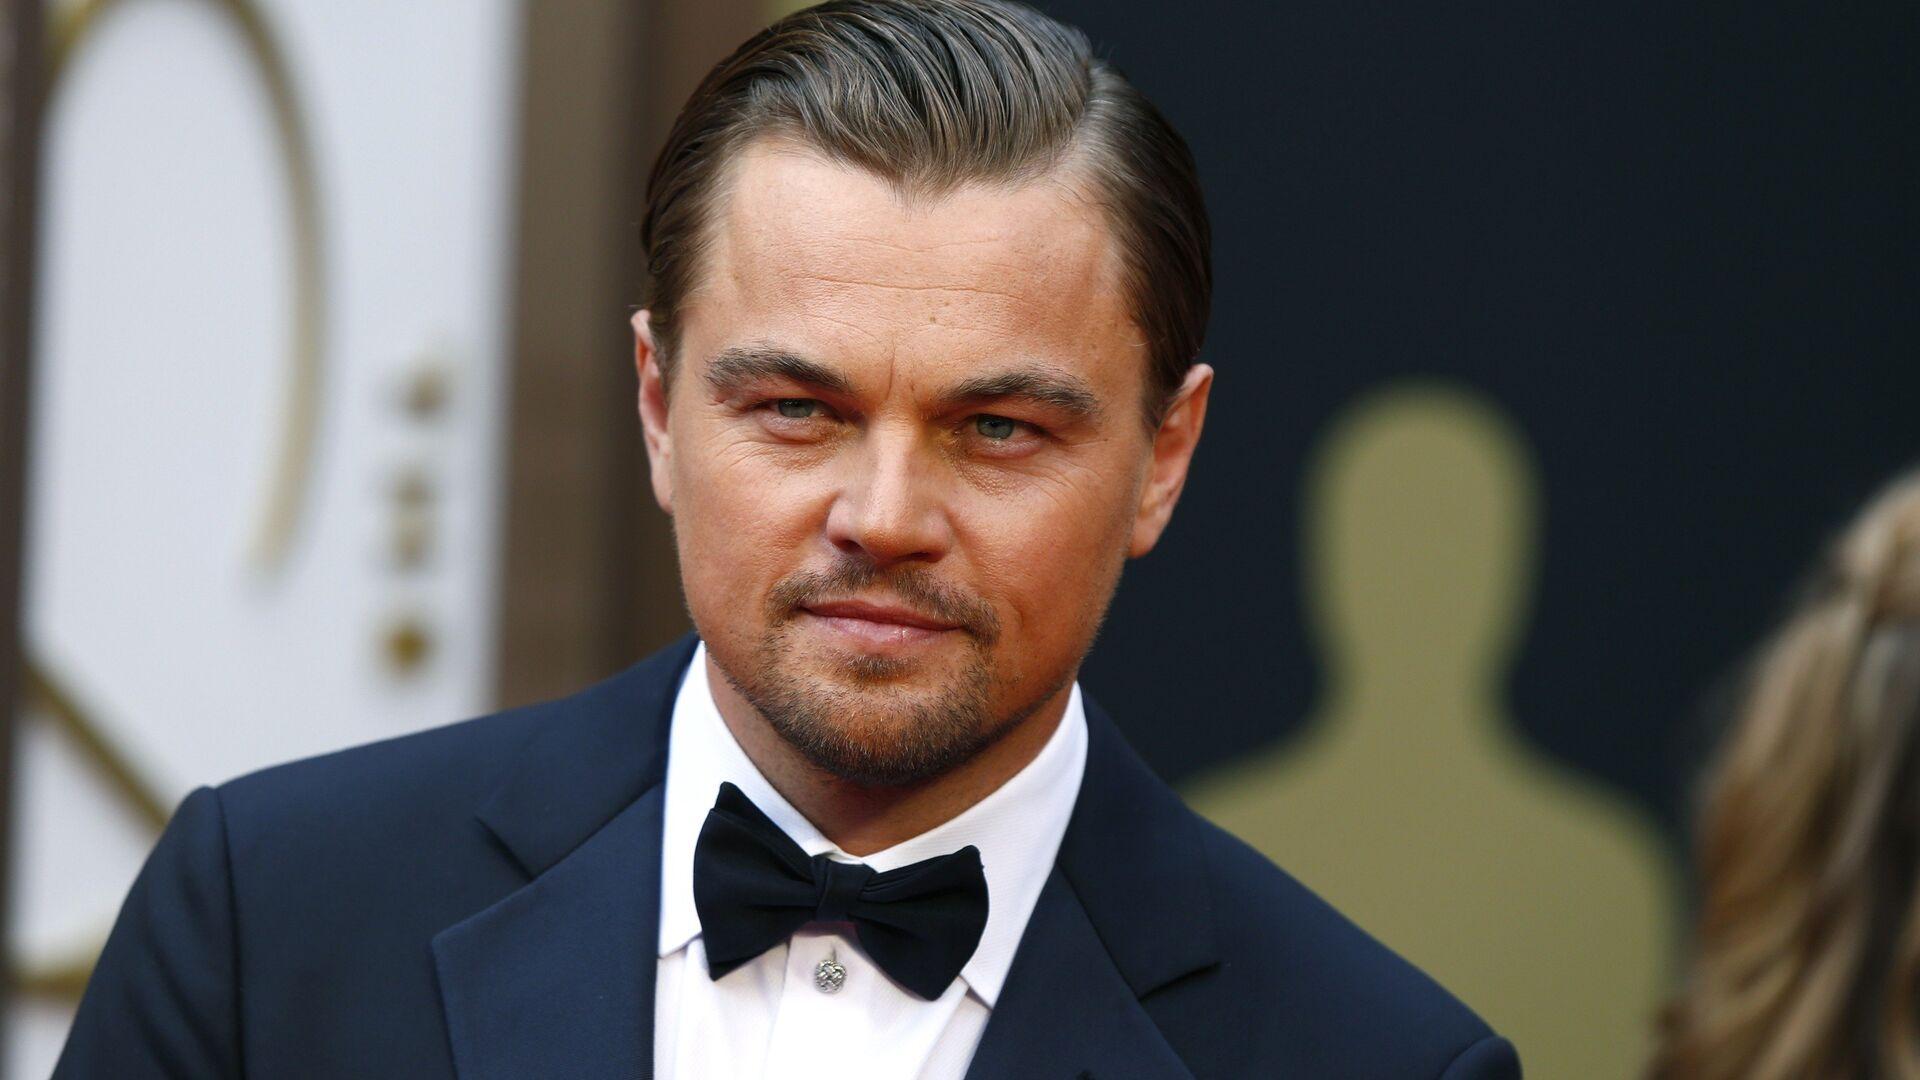 Leonardo Di Caprio, el actor estadounidense - Sputnik Mundo, 1920, 03.06.2021